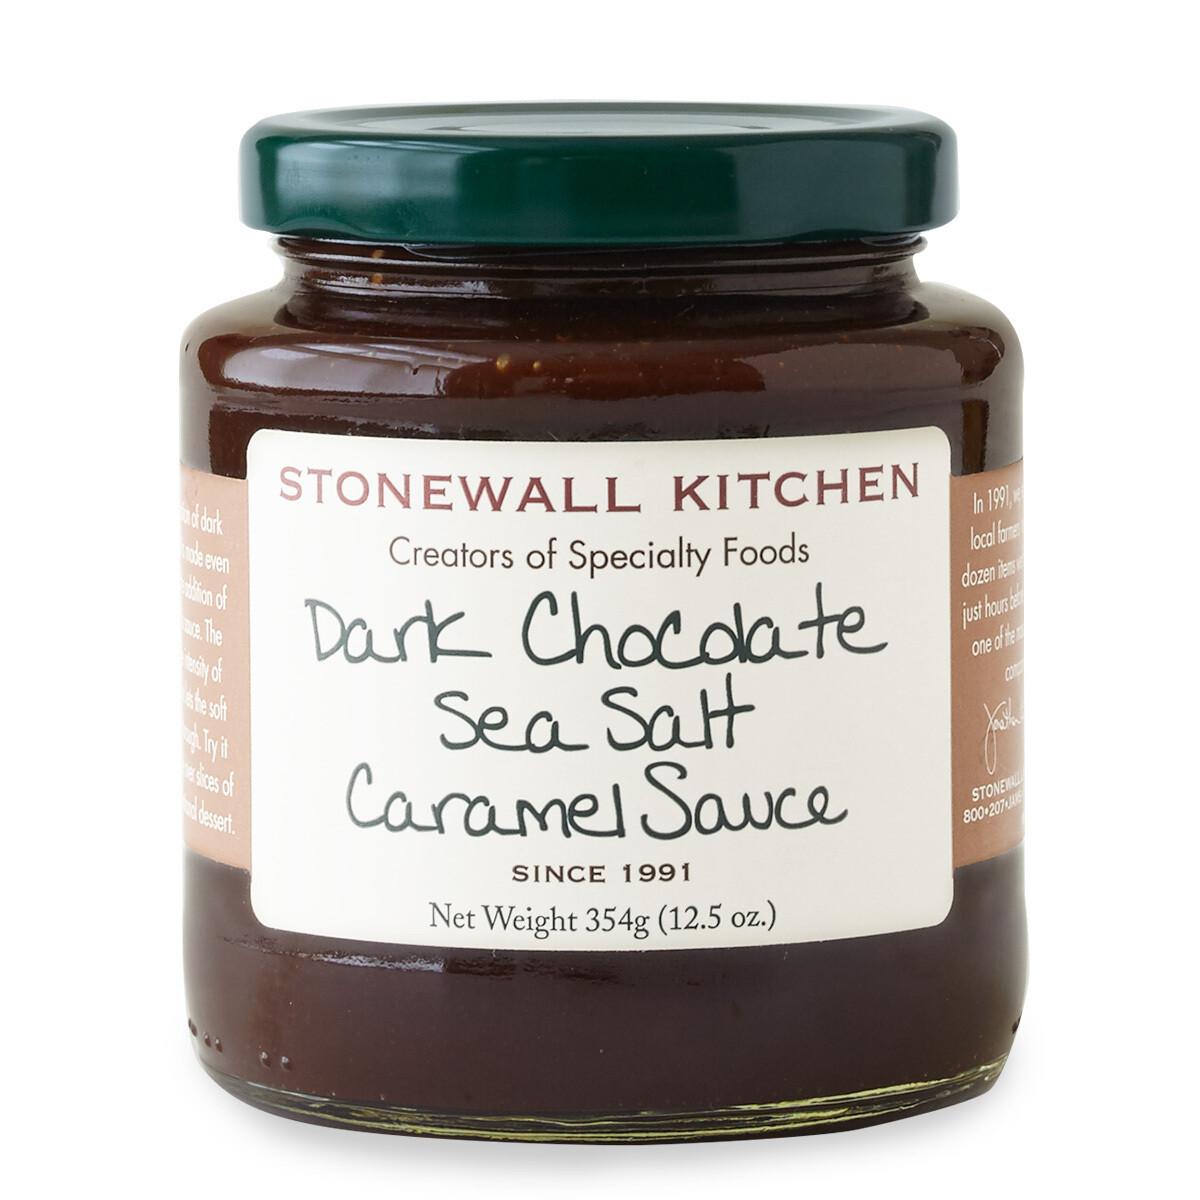 Dark chocolate sea salt caramel sauce